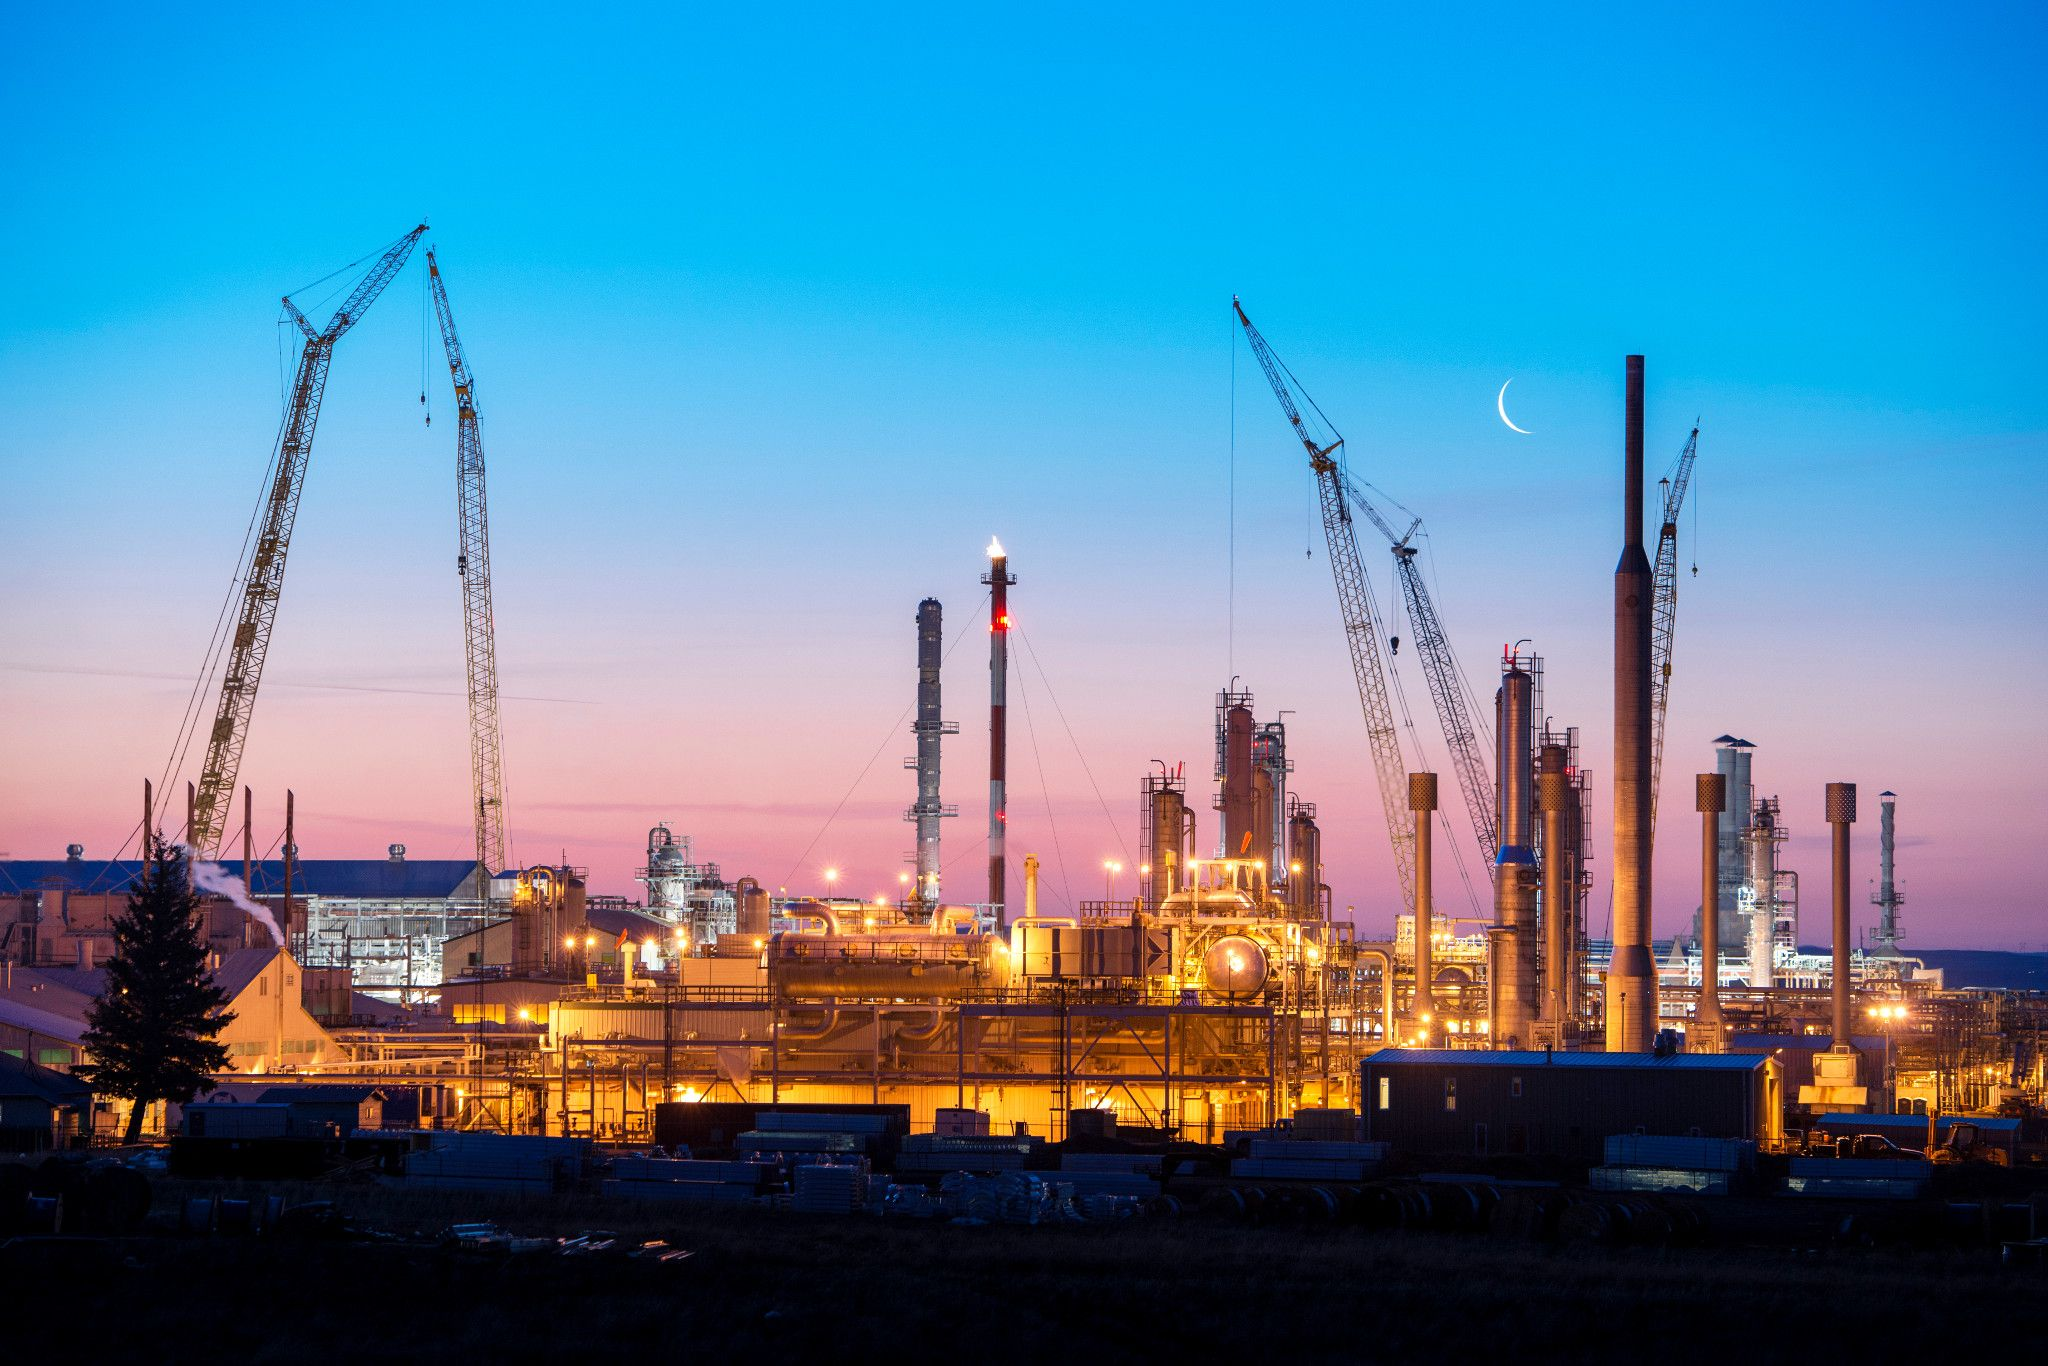 Tioga Gas Plant Expansion